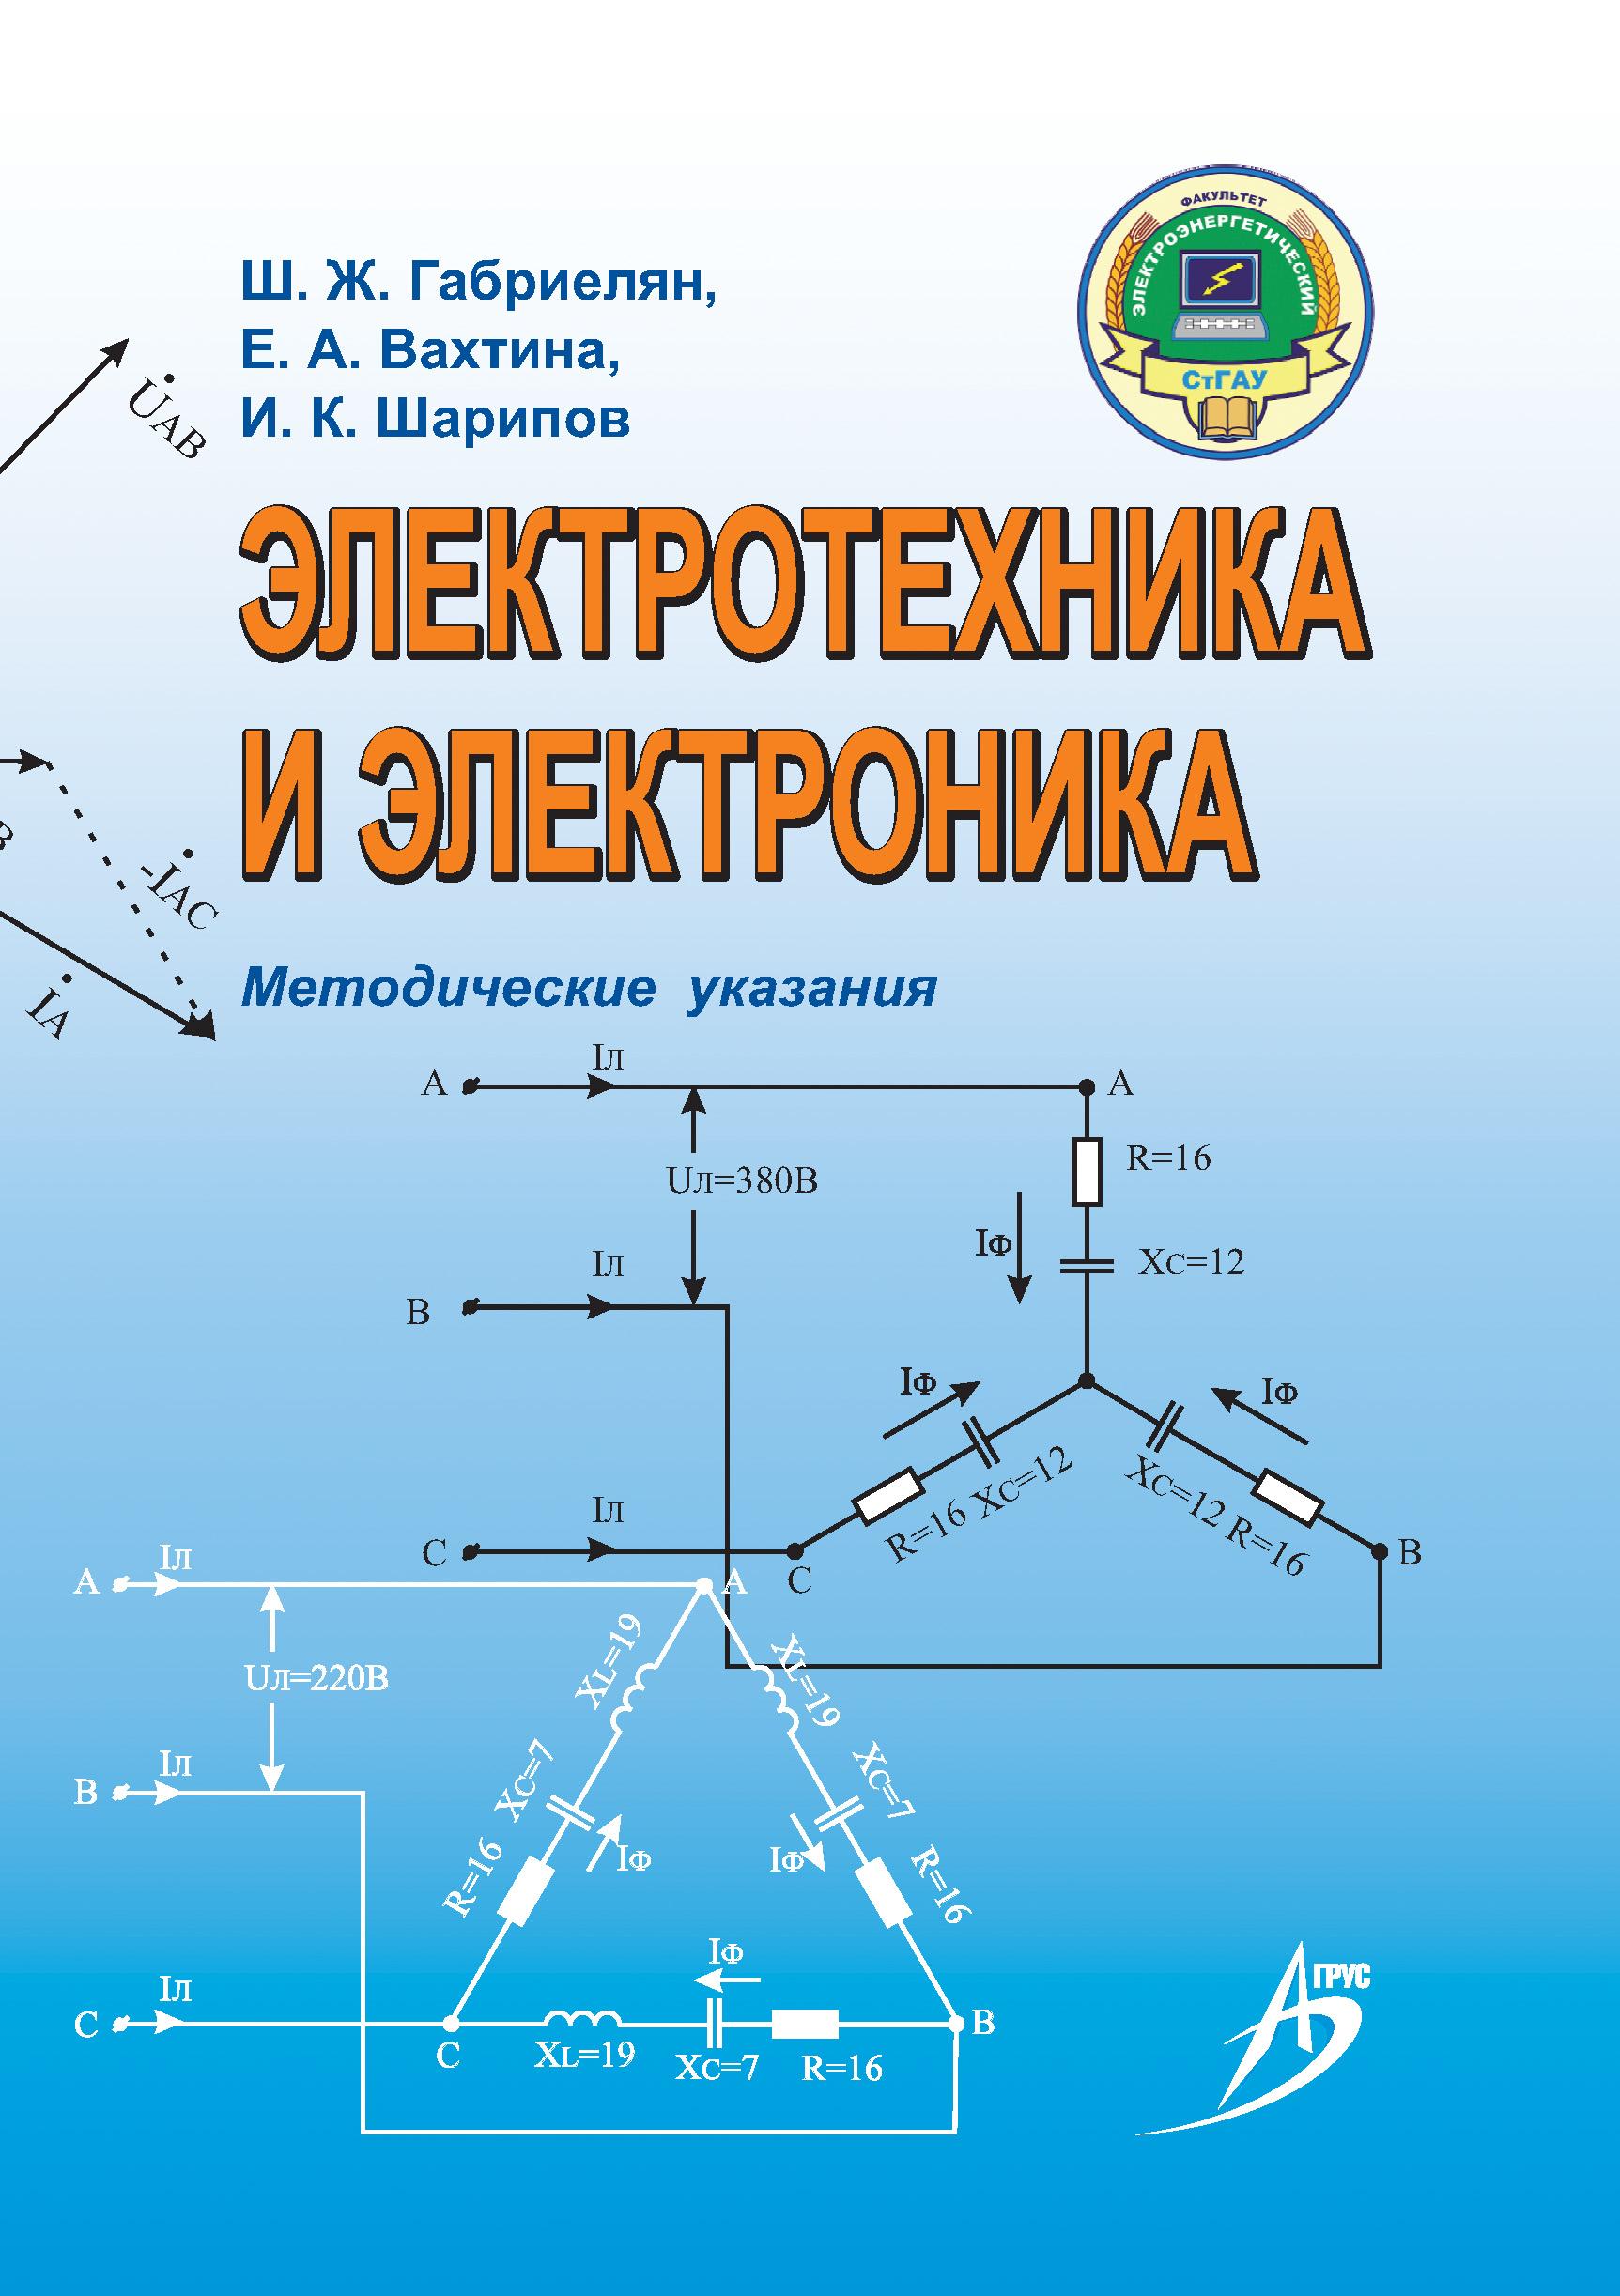 И. К. Шарипов Электротехника и электроника. Методические указания л и фуфаева электротехника сборник практических задач